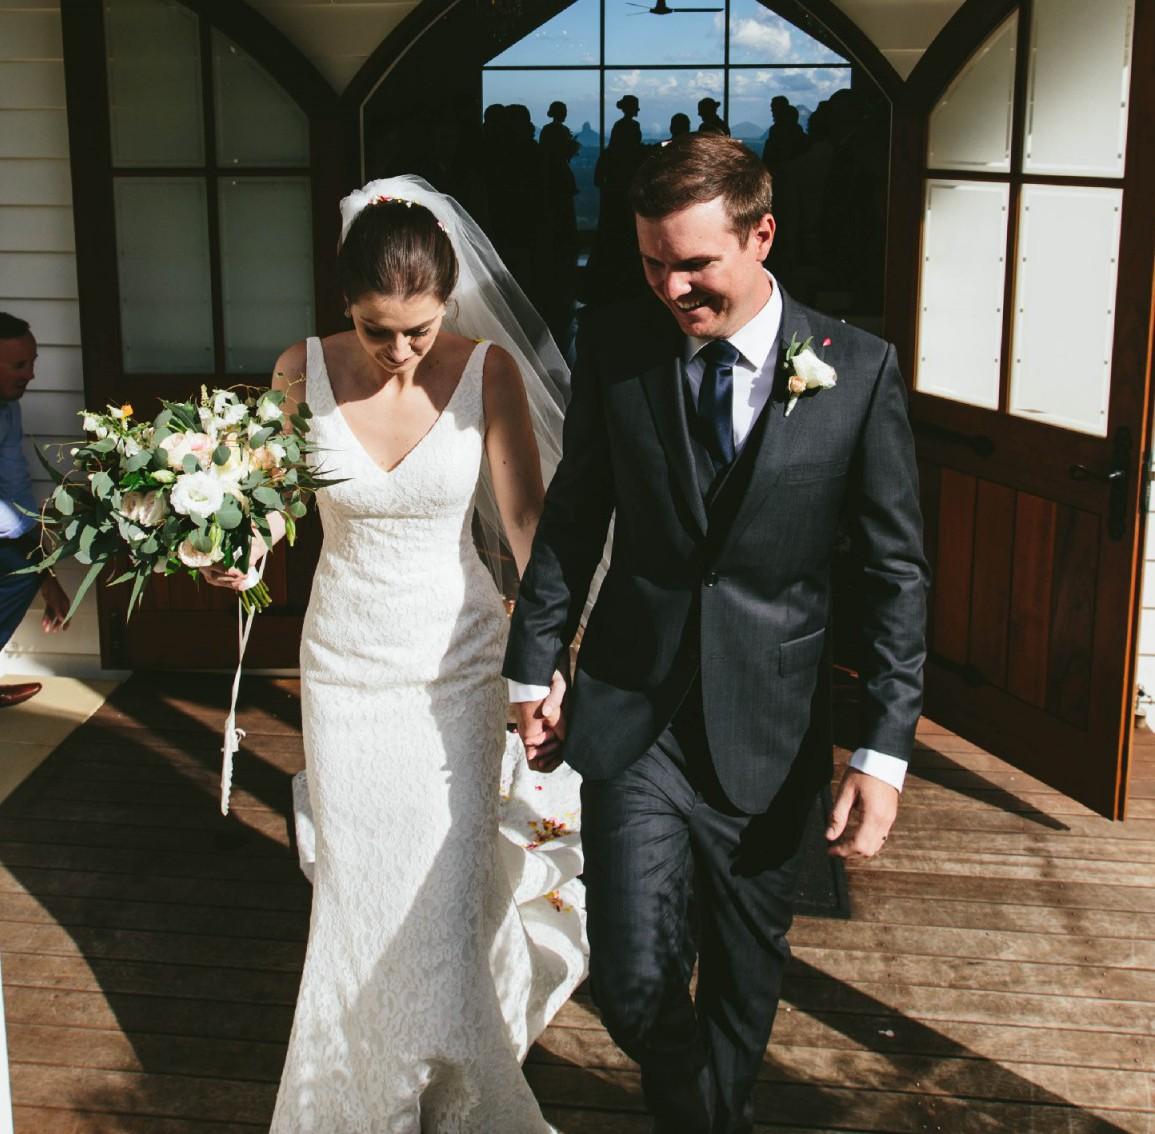 Pronovias Maricel Preowned Wedding Dress On Sale 50% Off